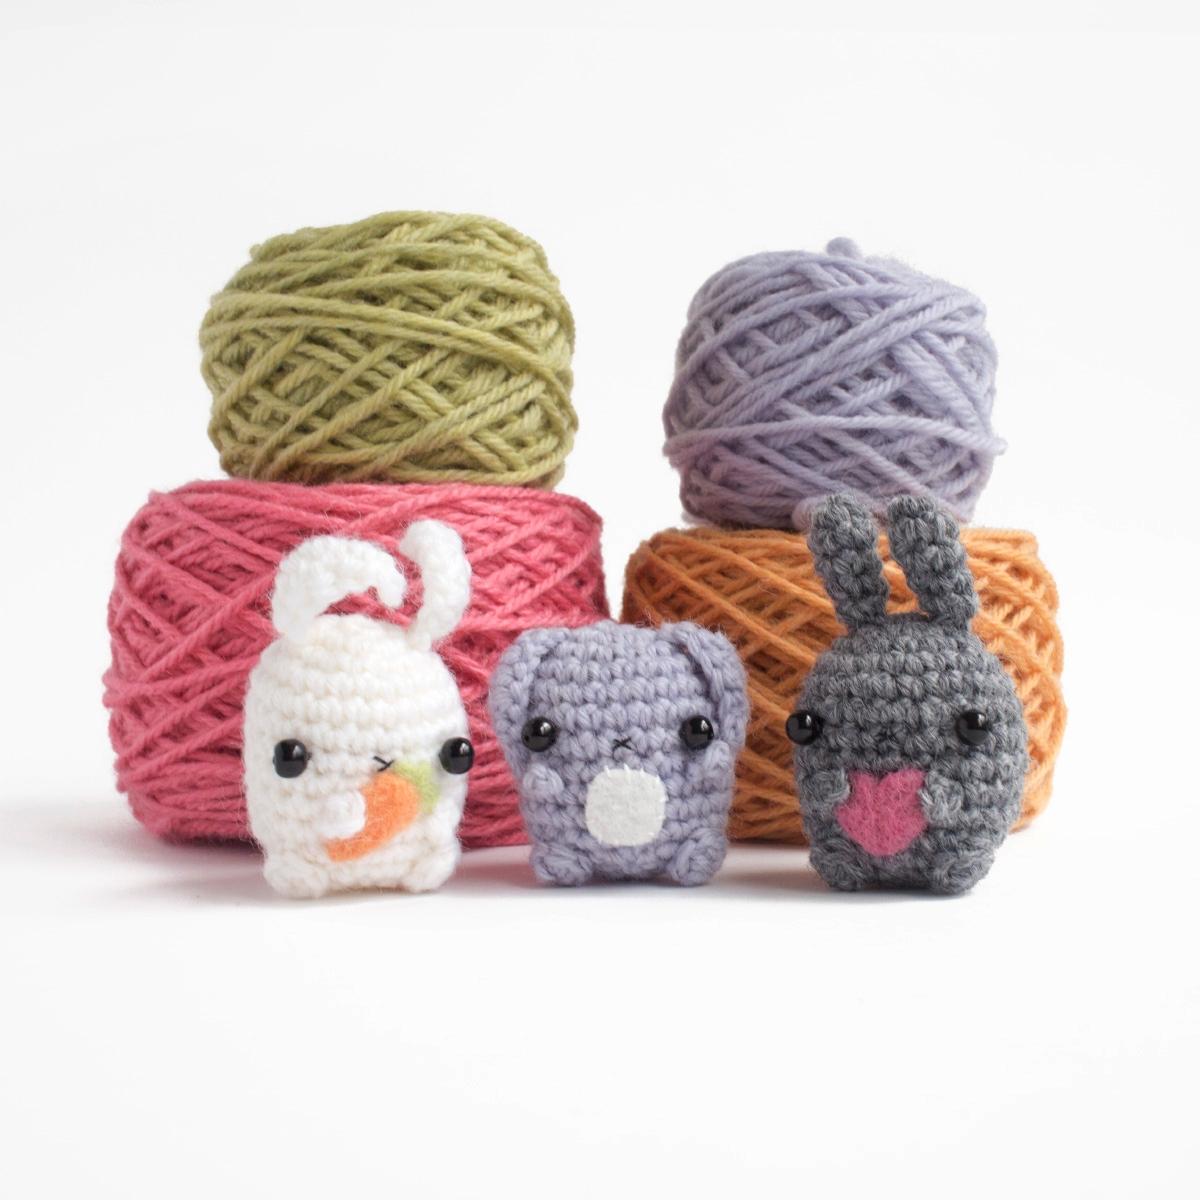 amigurumi bunny pattern ready ✧ - mohu | ello